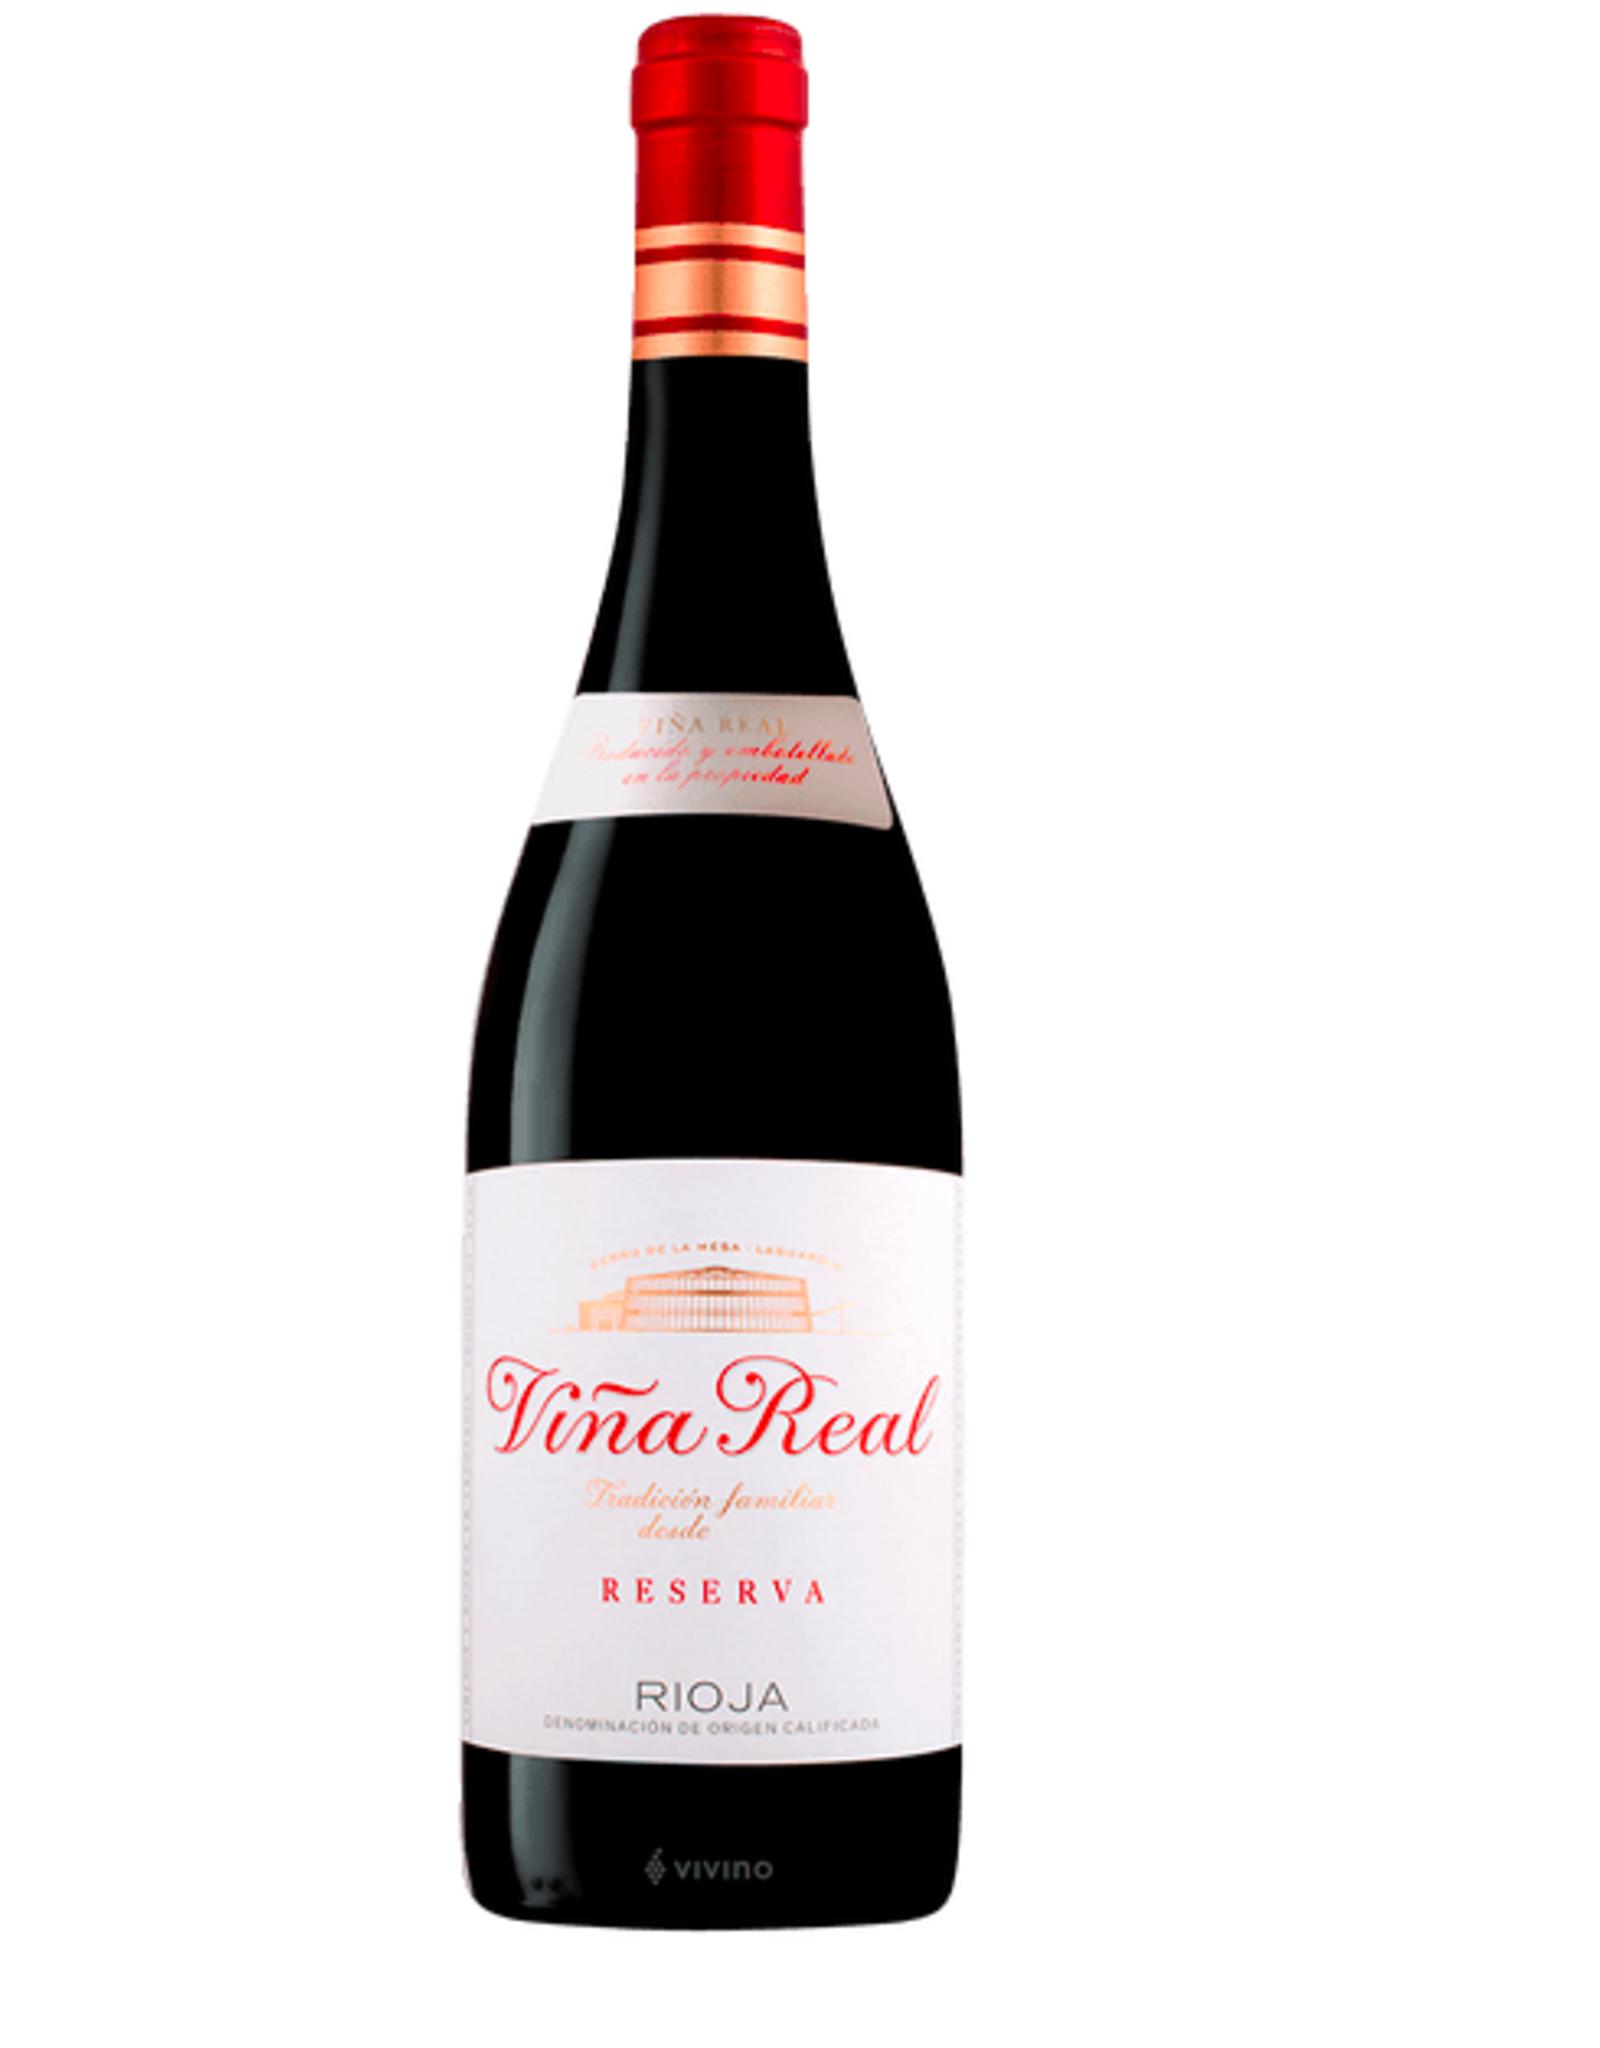 Vina Real Rioja Reserva 2010 1.5L